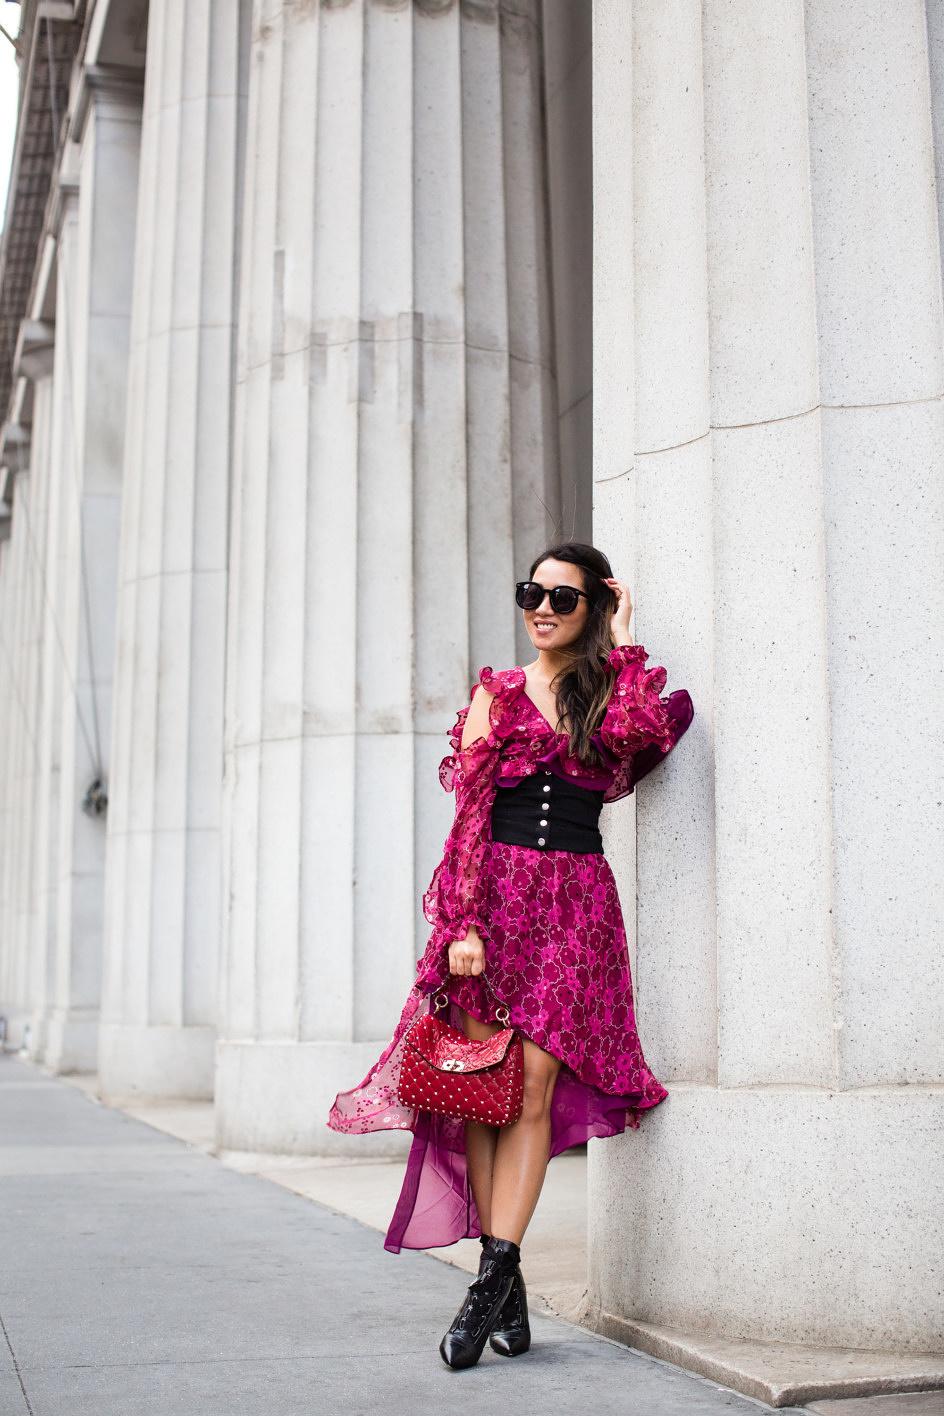 c5997576b17 The 20 Petite Fashion Bloggers You Need to Follow